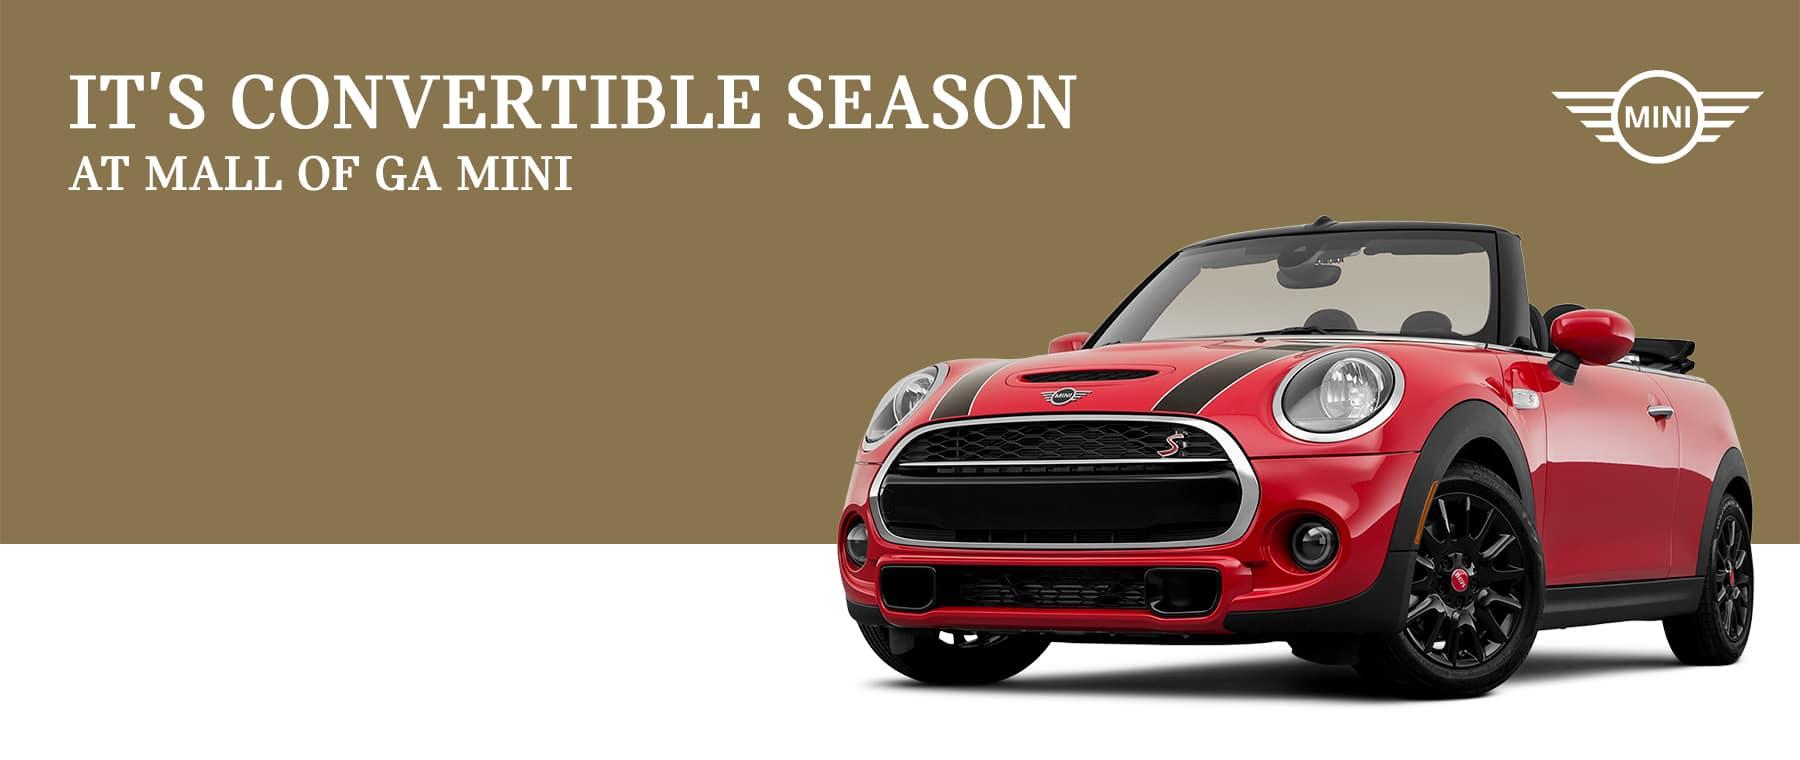 MOG Mini-Apr21_TR_New Vehicle Incentives 1800x760_0003_convertible